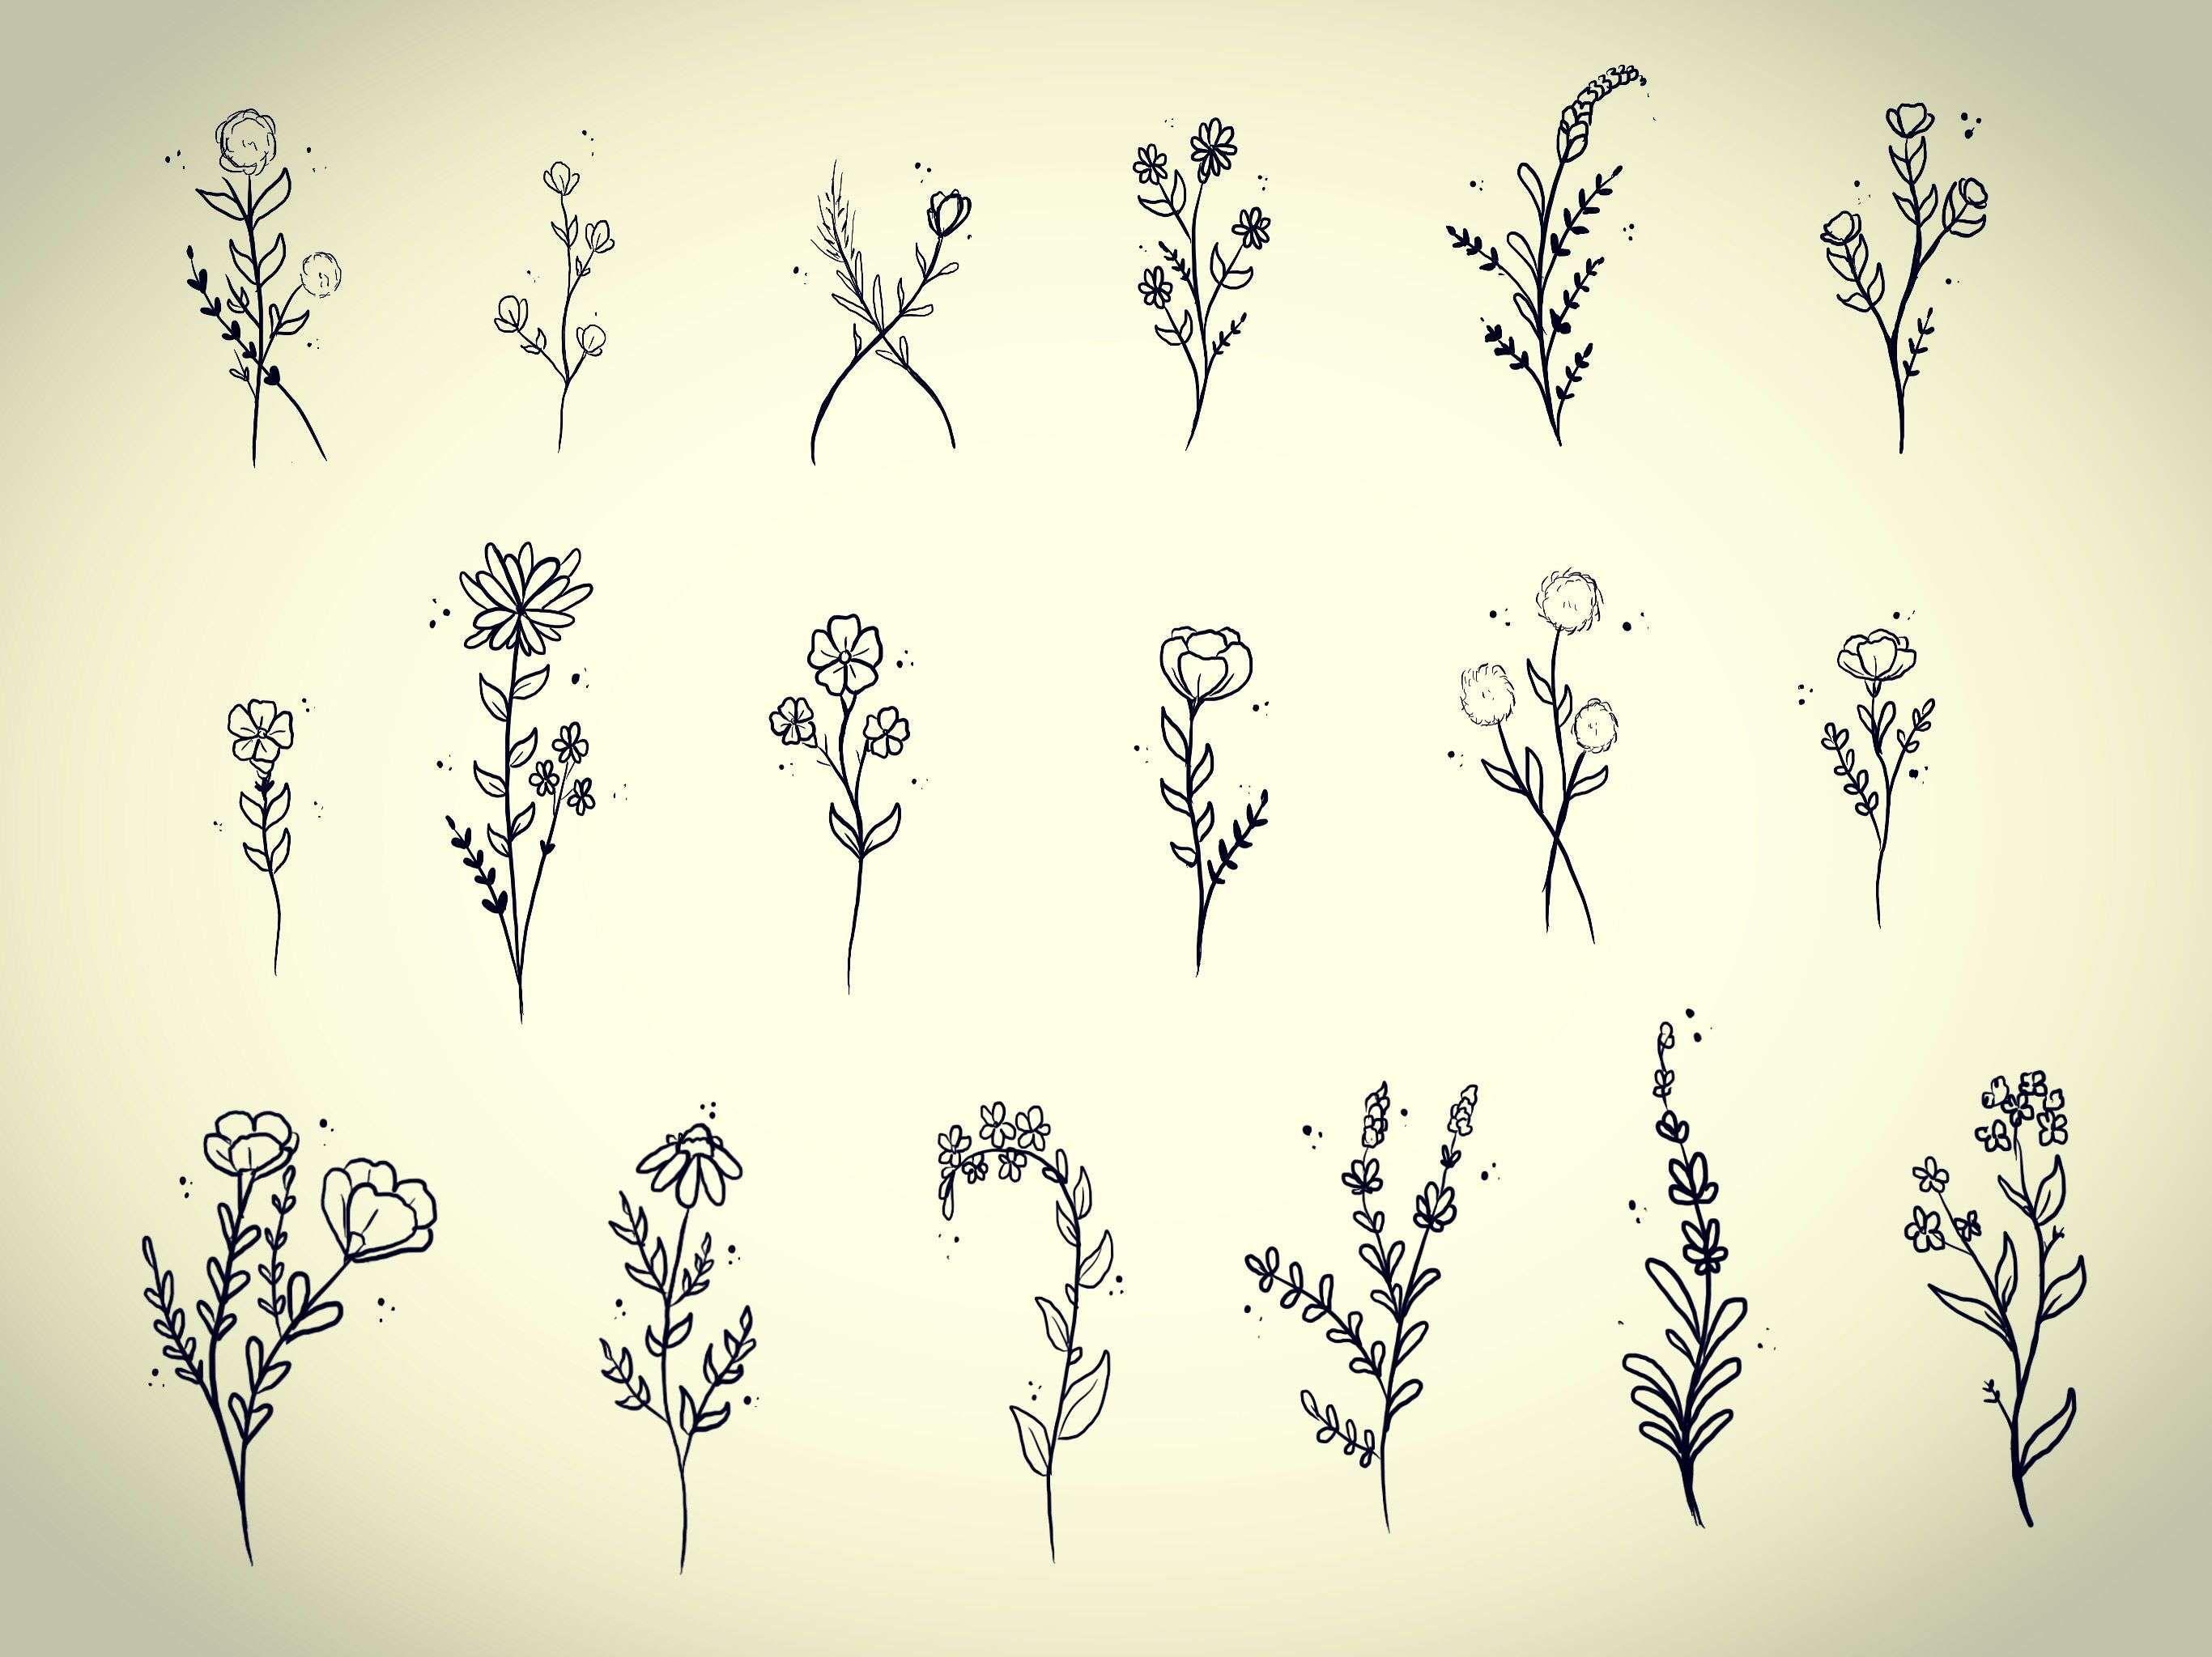 Inspiration For Cute Simple Mini Flower Tattoo Ideas Elegant Small Custom Flowers By Casey Hart At Rose Re Tiny Flower Tattoos Red Tattoos Simple Flower Tattoo